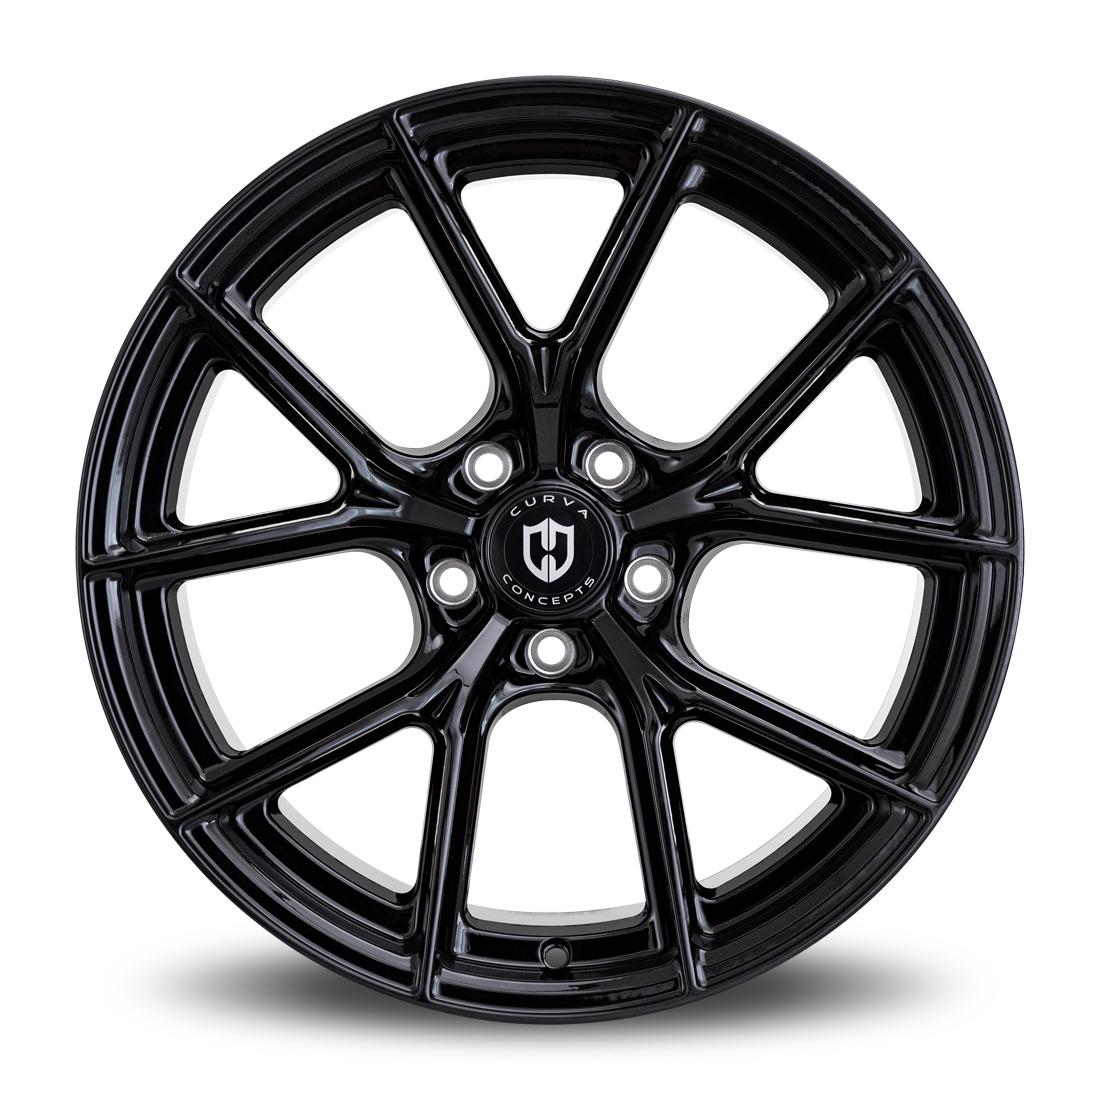 Curva Wheels C70 - Gloss Black Rim